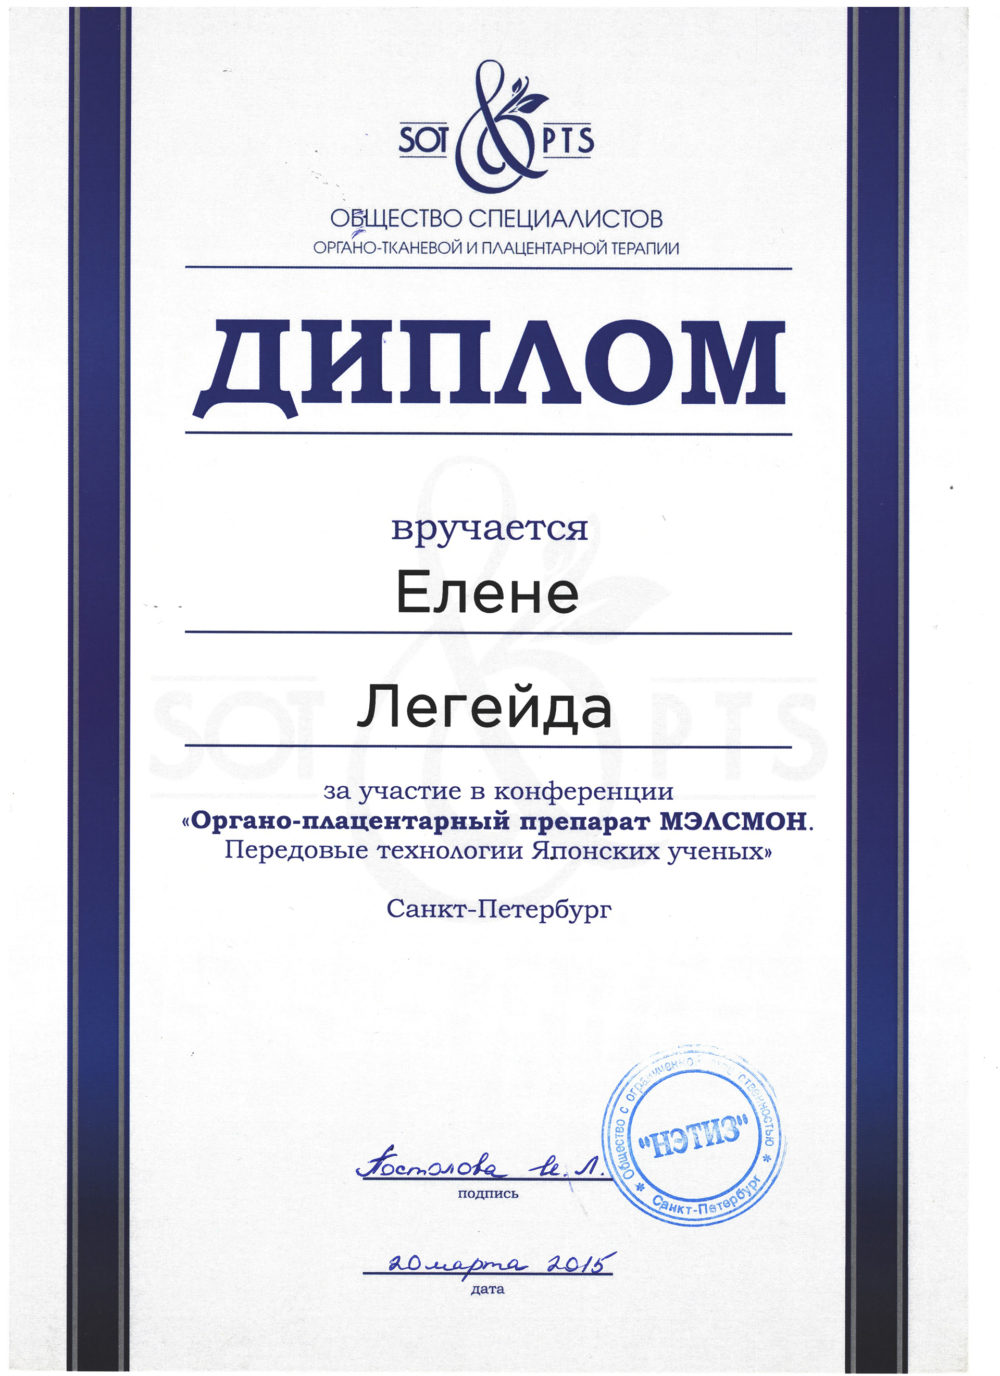 "Сертификат - Конференция ""Препарат Мэлсмон"". Легейда Елена Валерьевна"